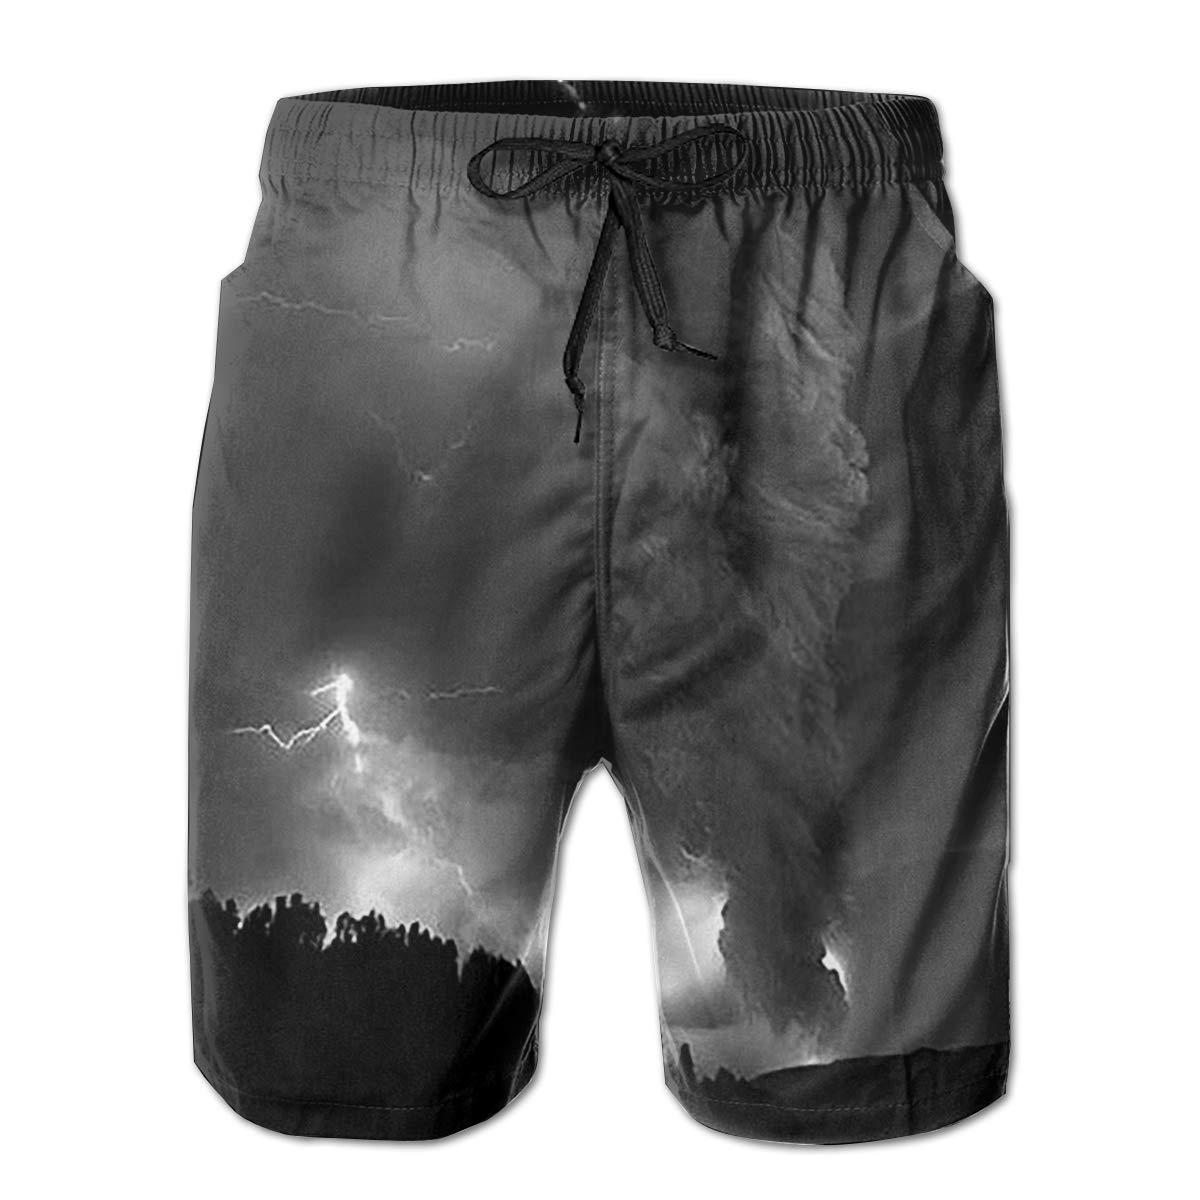 Mens Swim Trunks Black Tornado Quick Dry Beach Board Shorts with Mesh Lining